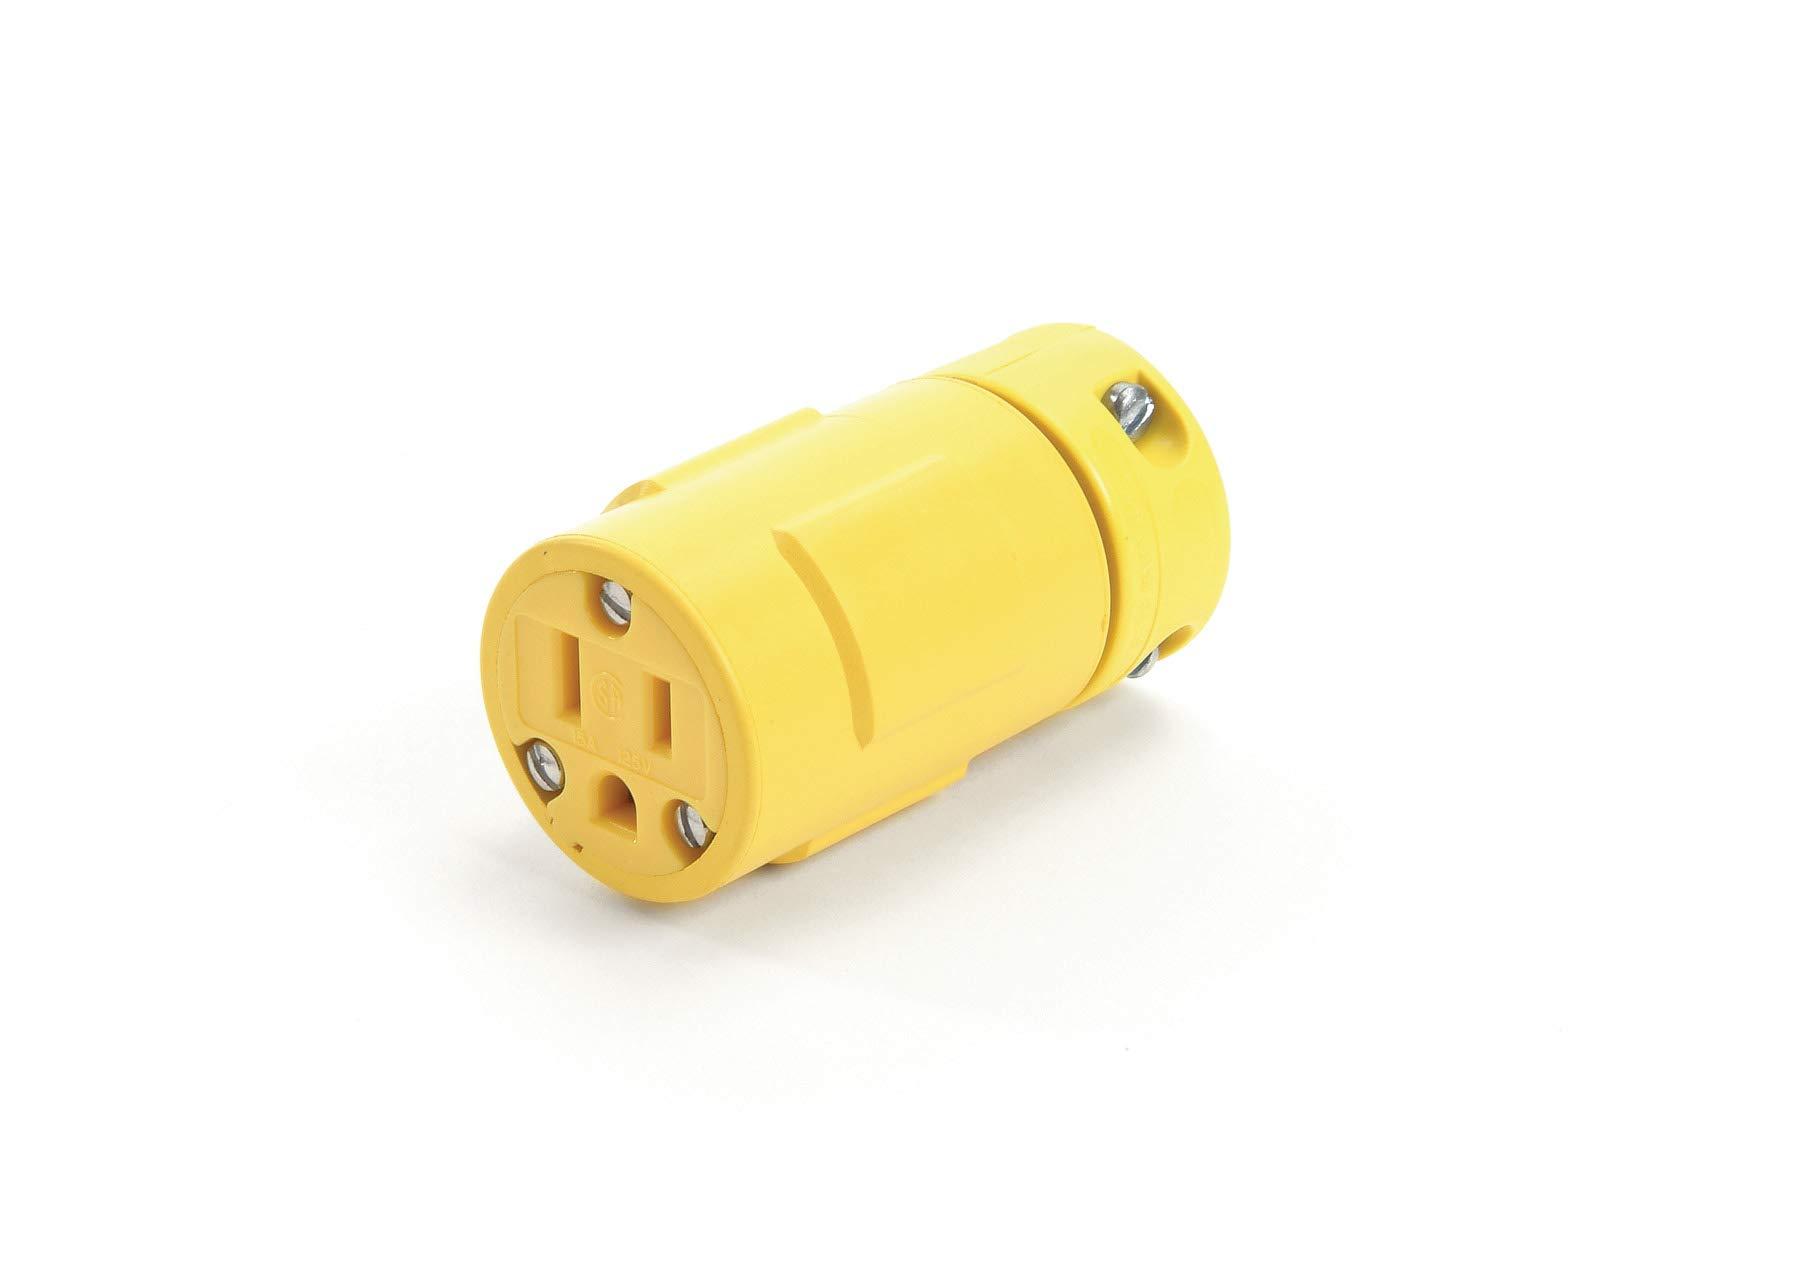 Woodhead 1547 Super-Safeway Connector, 2 Poles, 3 Wires, NEMA 5-15 Configuration, Yellow, 15A Current, 125V Voltage